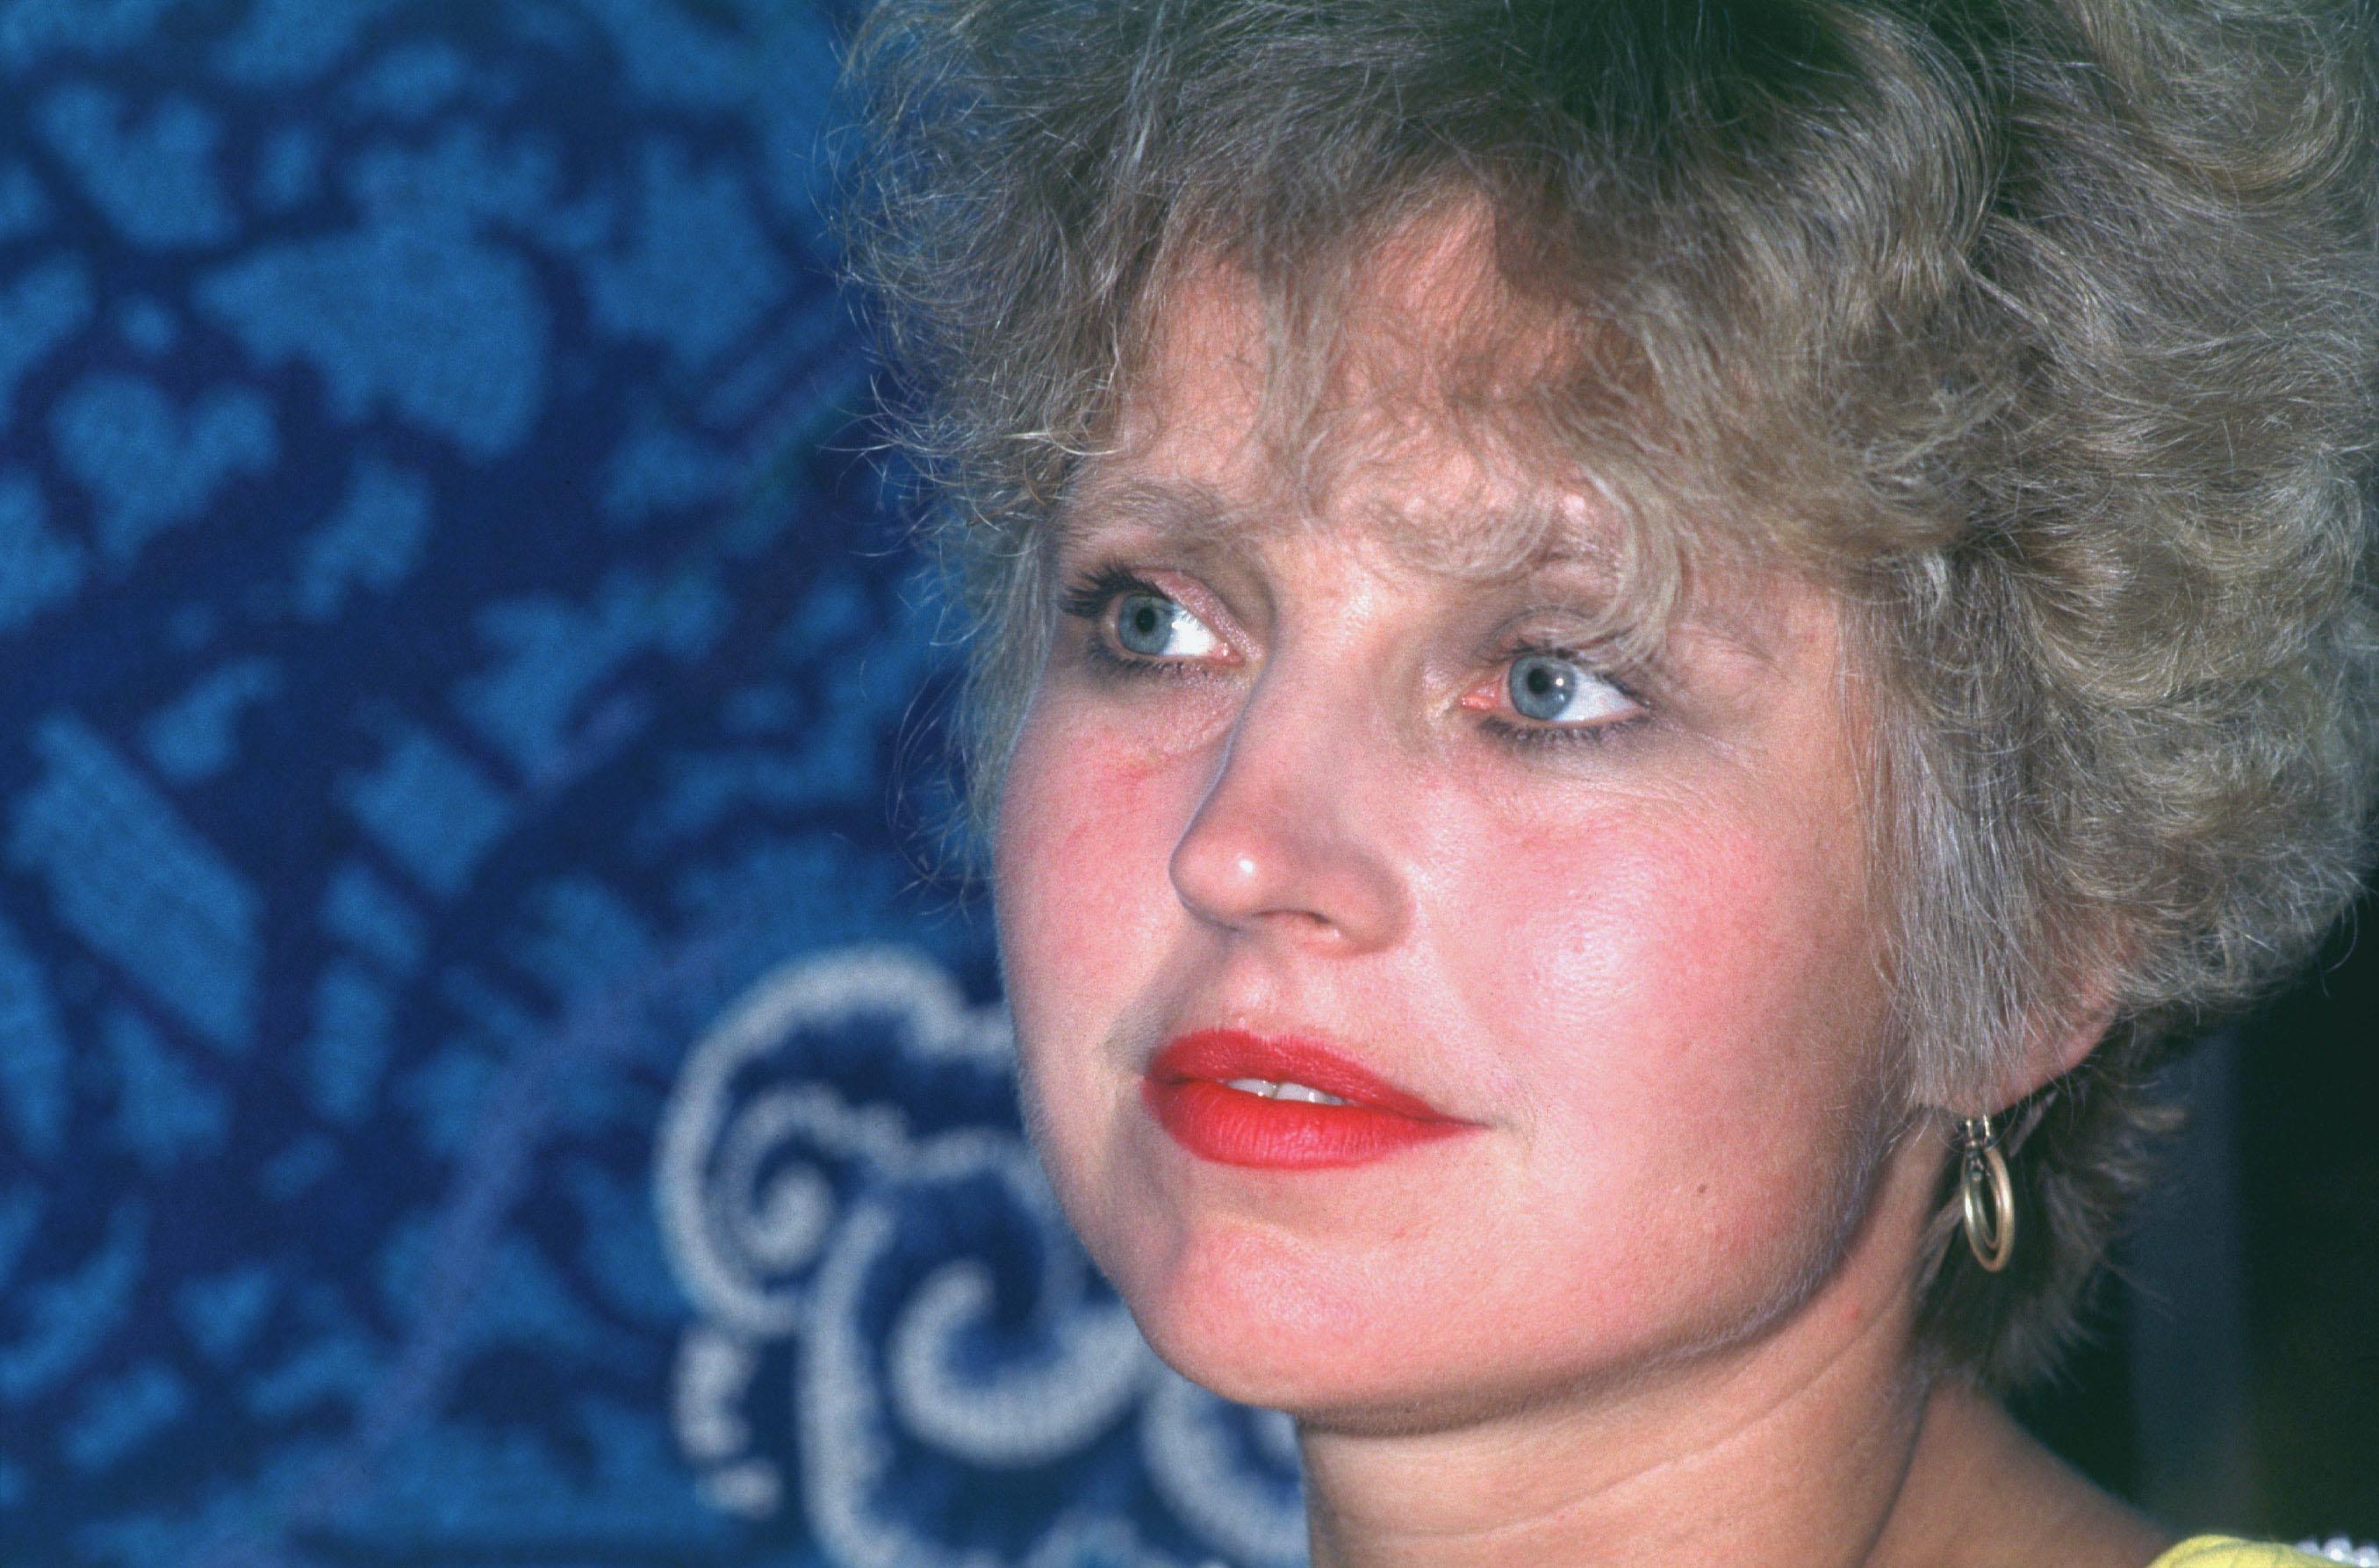 Hanna Schygulla in 1982